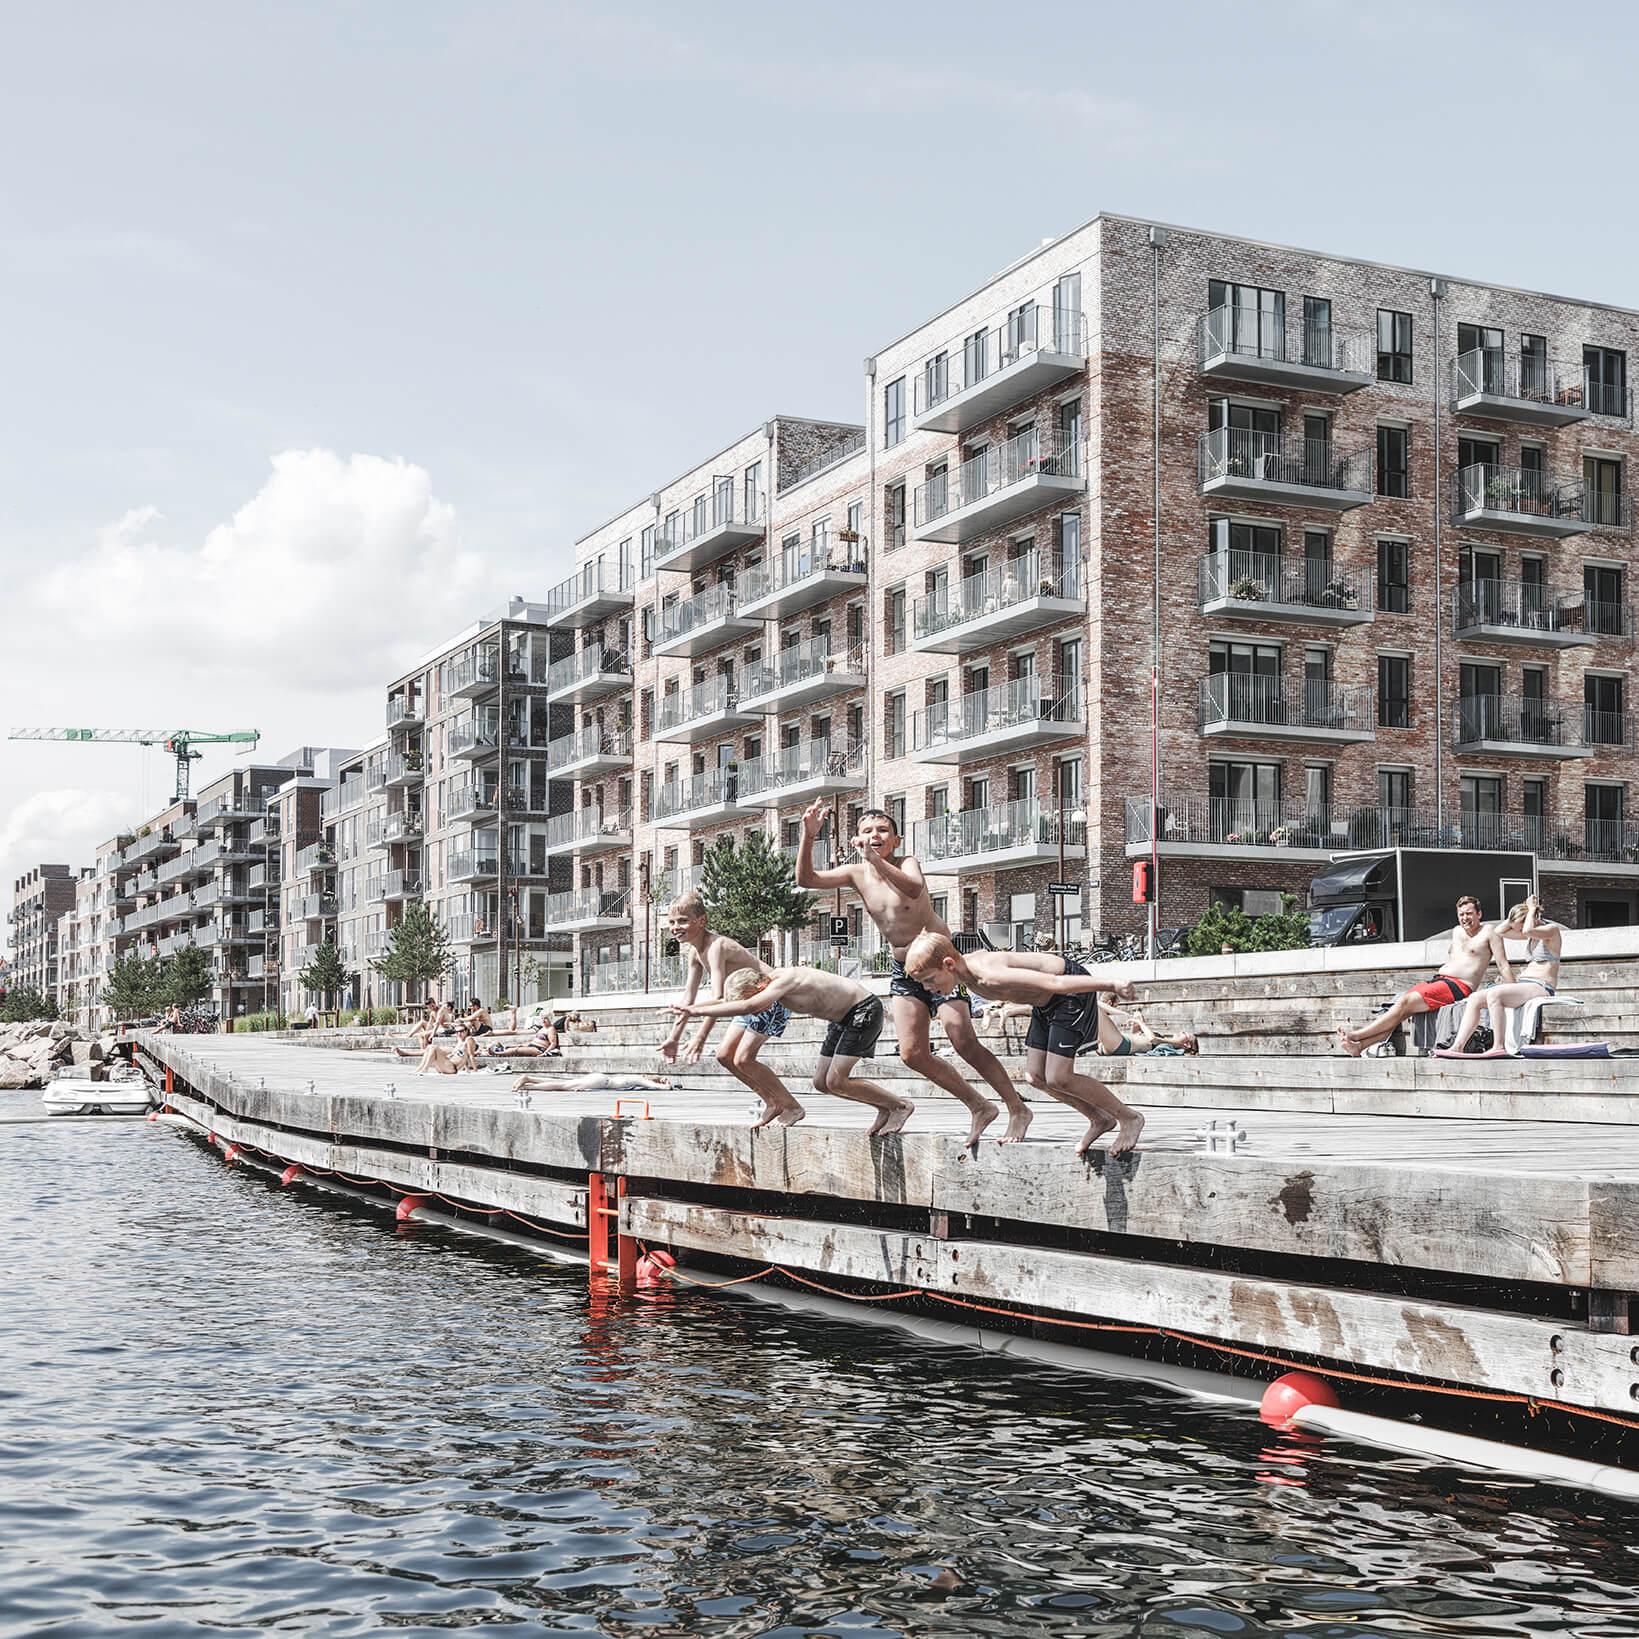 Nordhavn 02 credit Rasmus Hjortshoj COAST 2